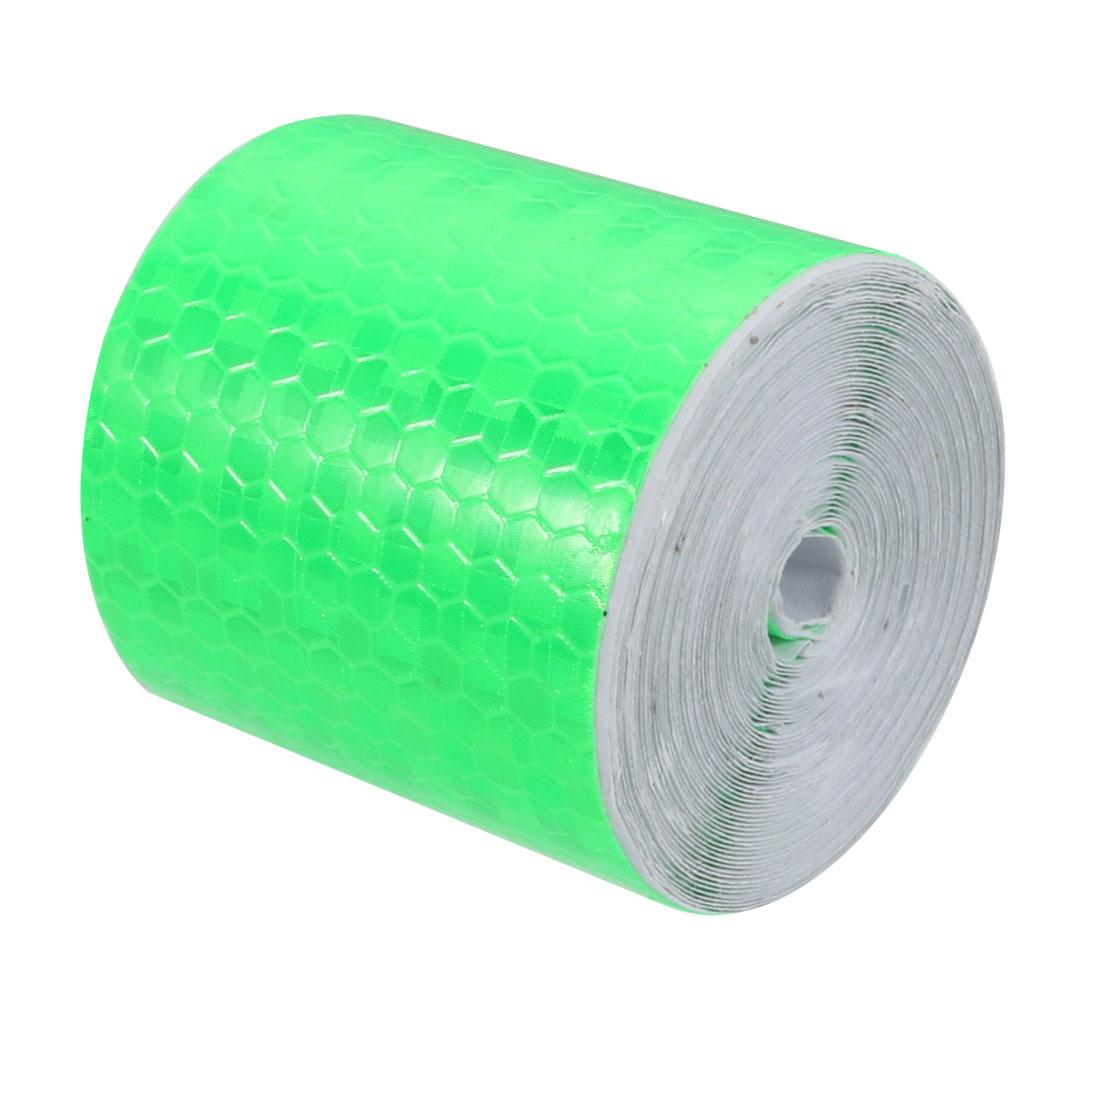 5cm Width 5Meter Length Honeycomb Adhesive Reflective Warning Tape Green